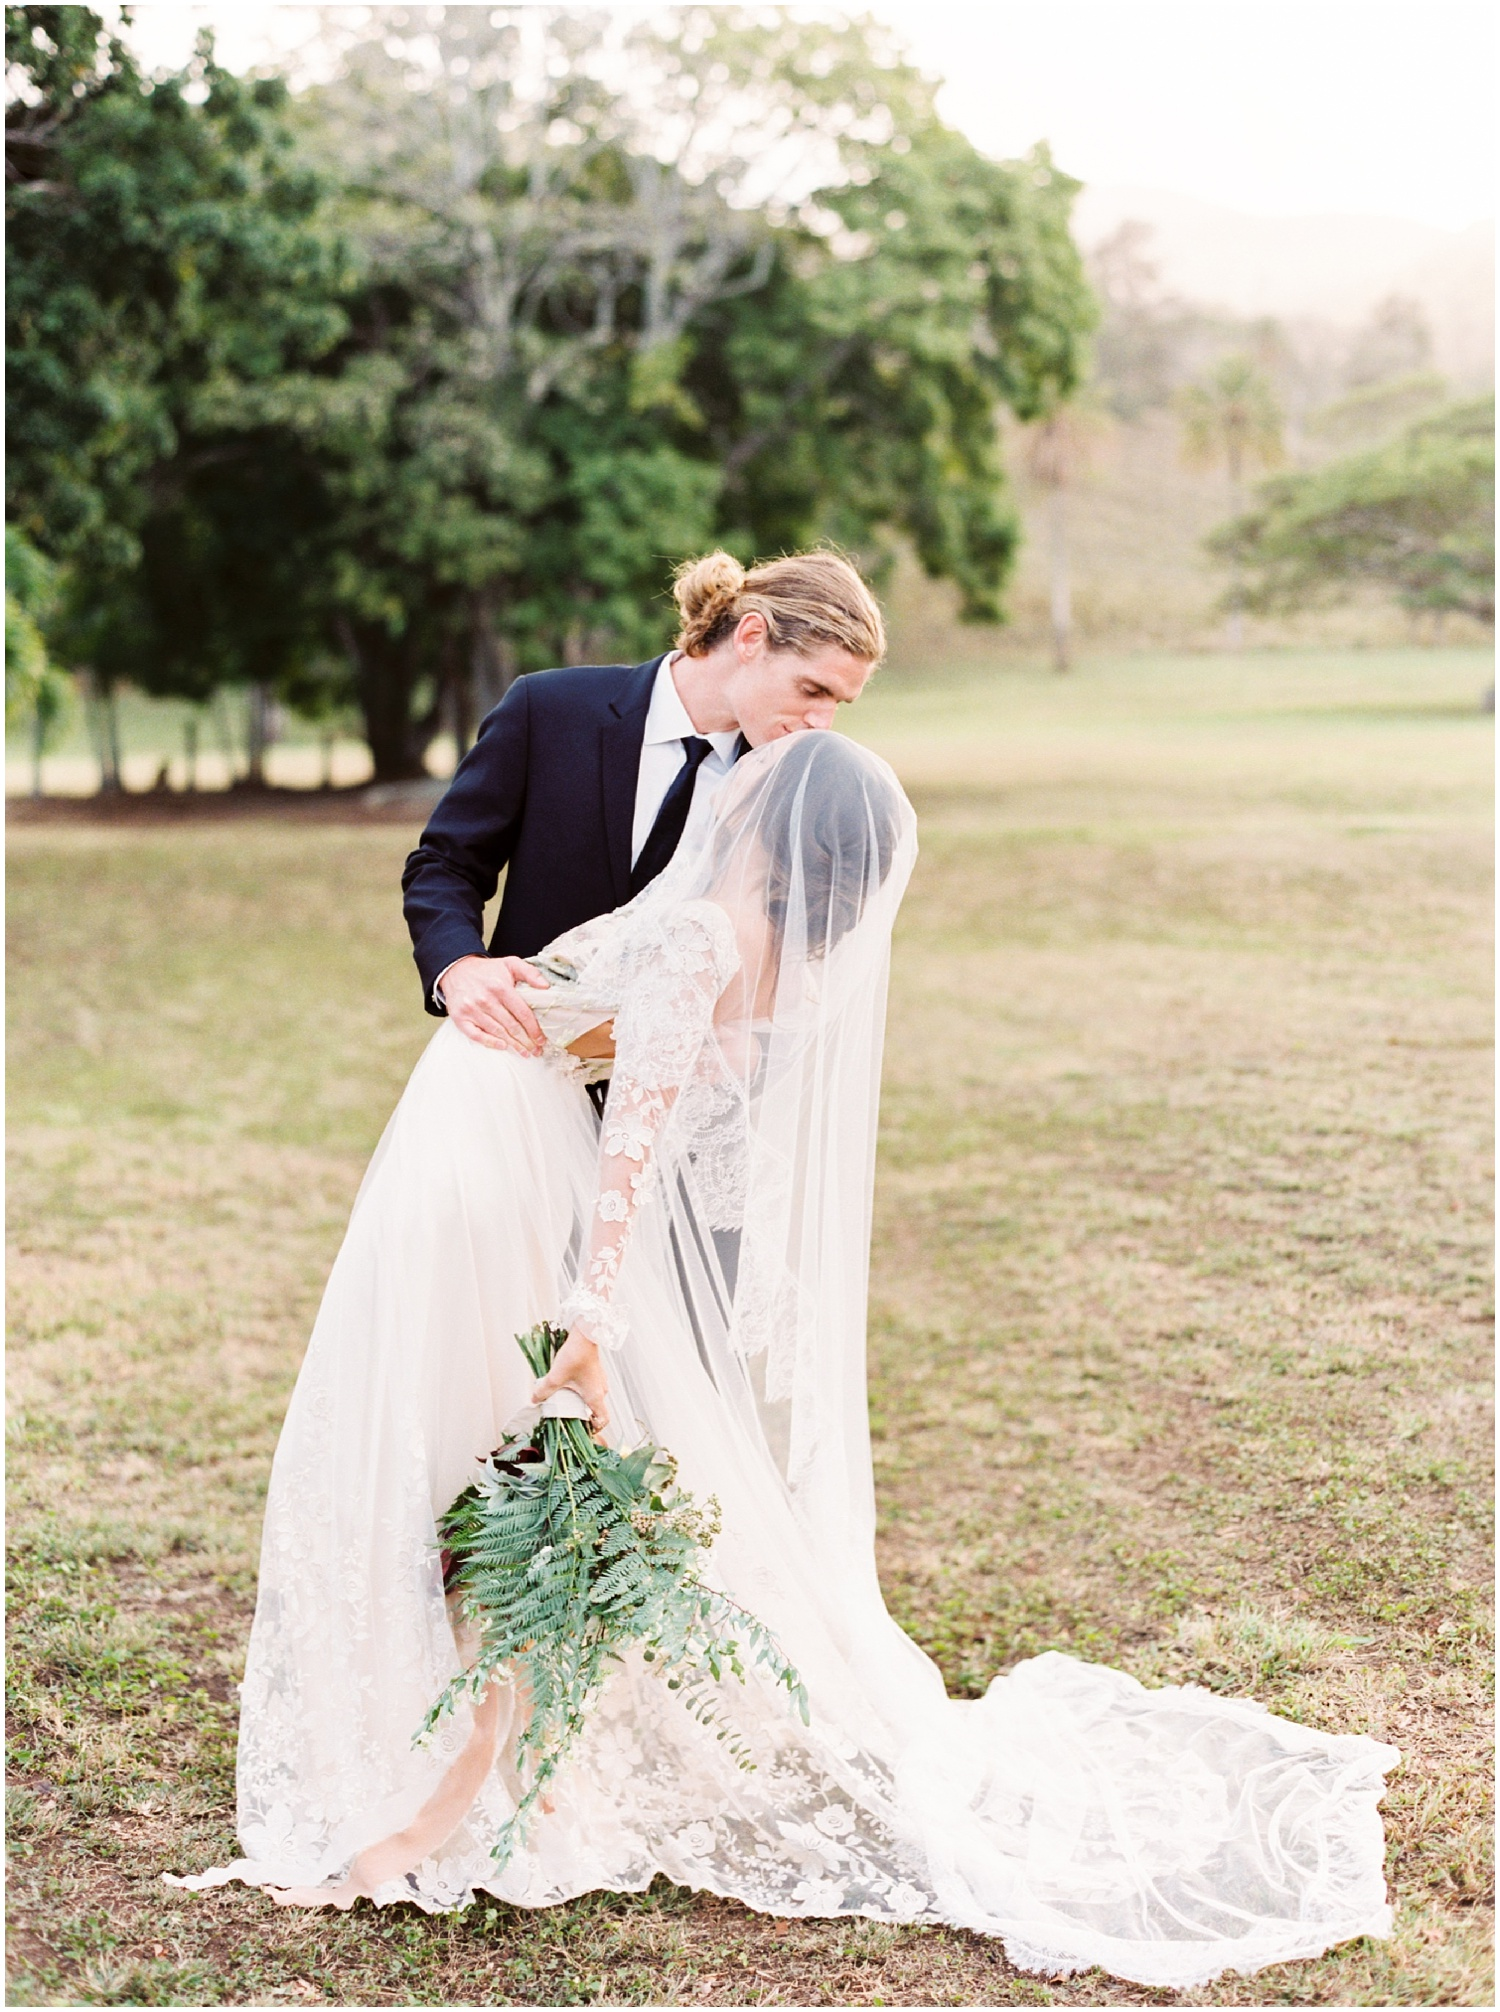 fresno wedding photographers, fresno wedding photographer, san luis obispo wedding photographers, fine art film photographer